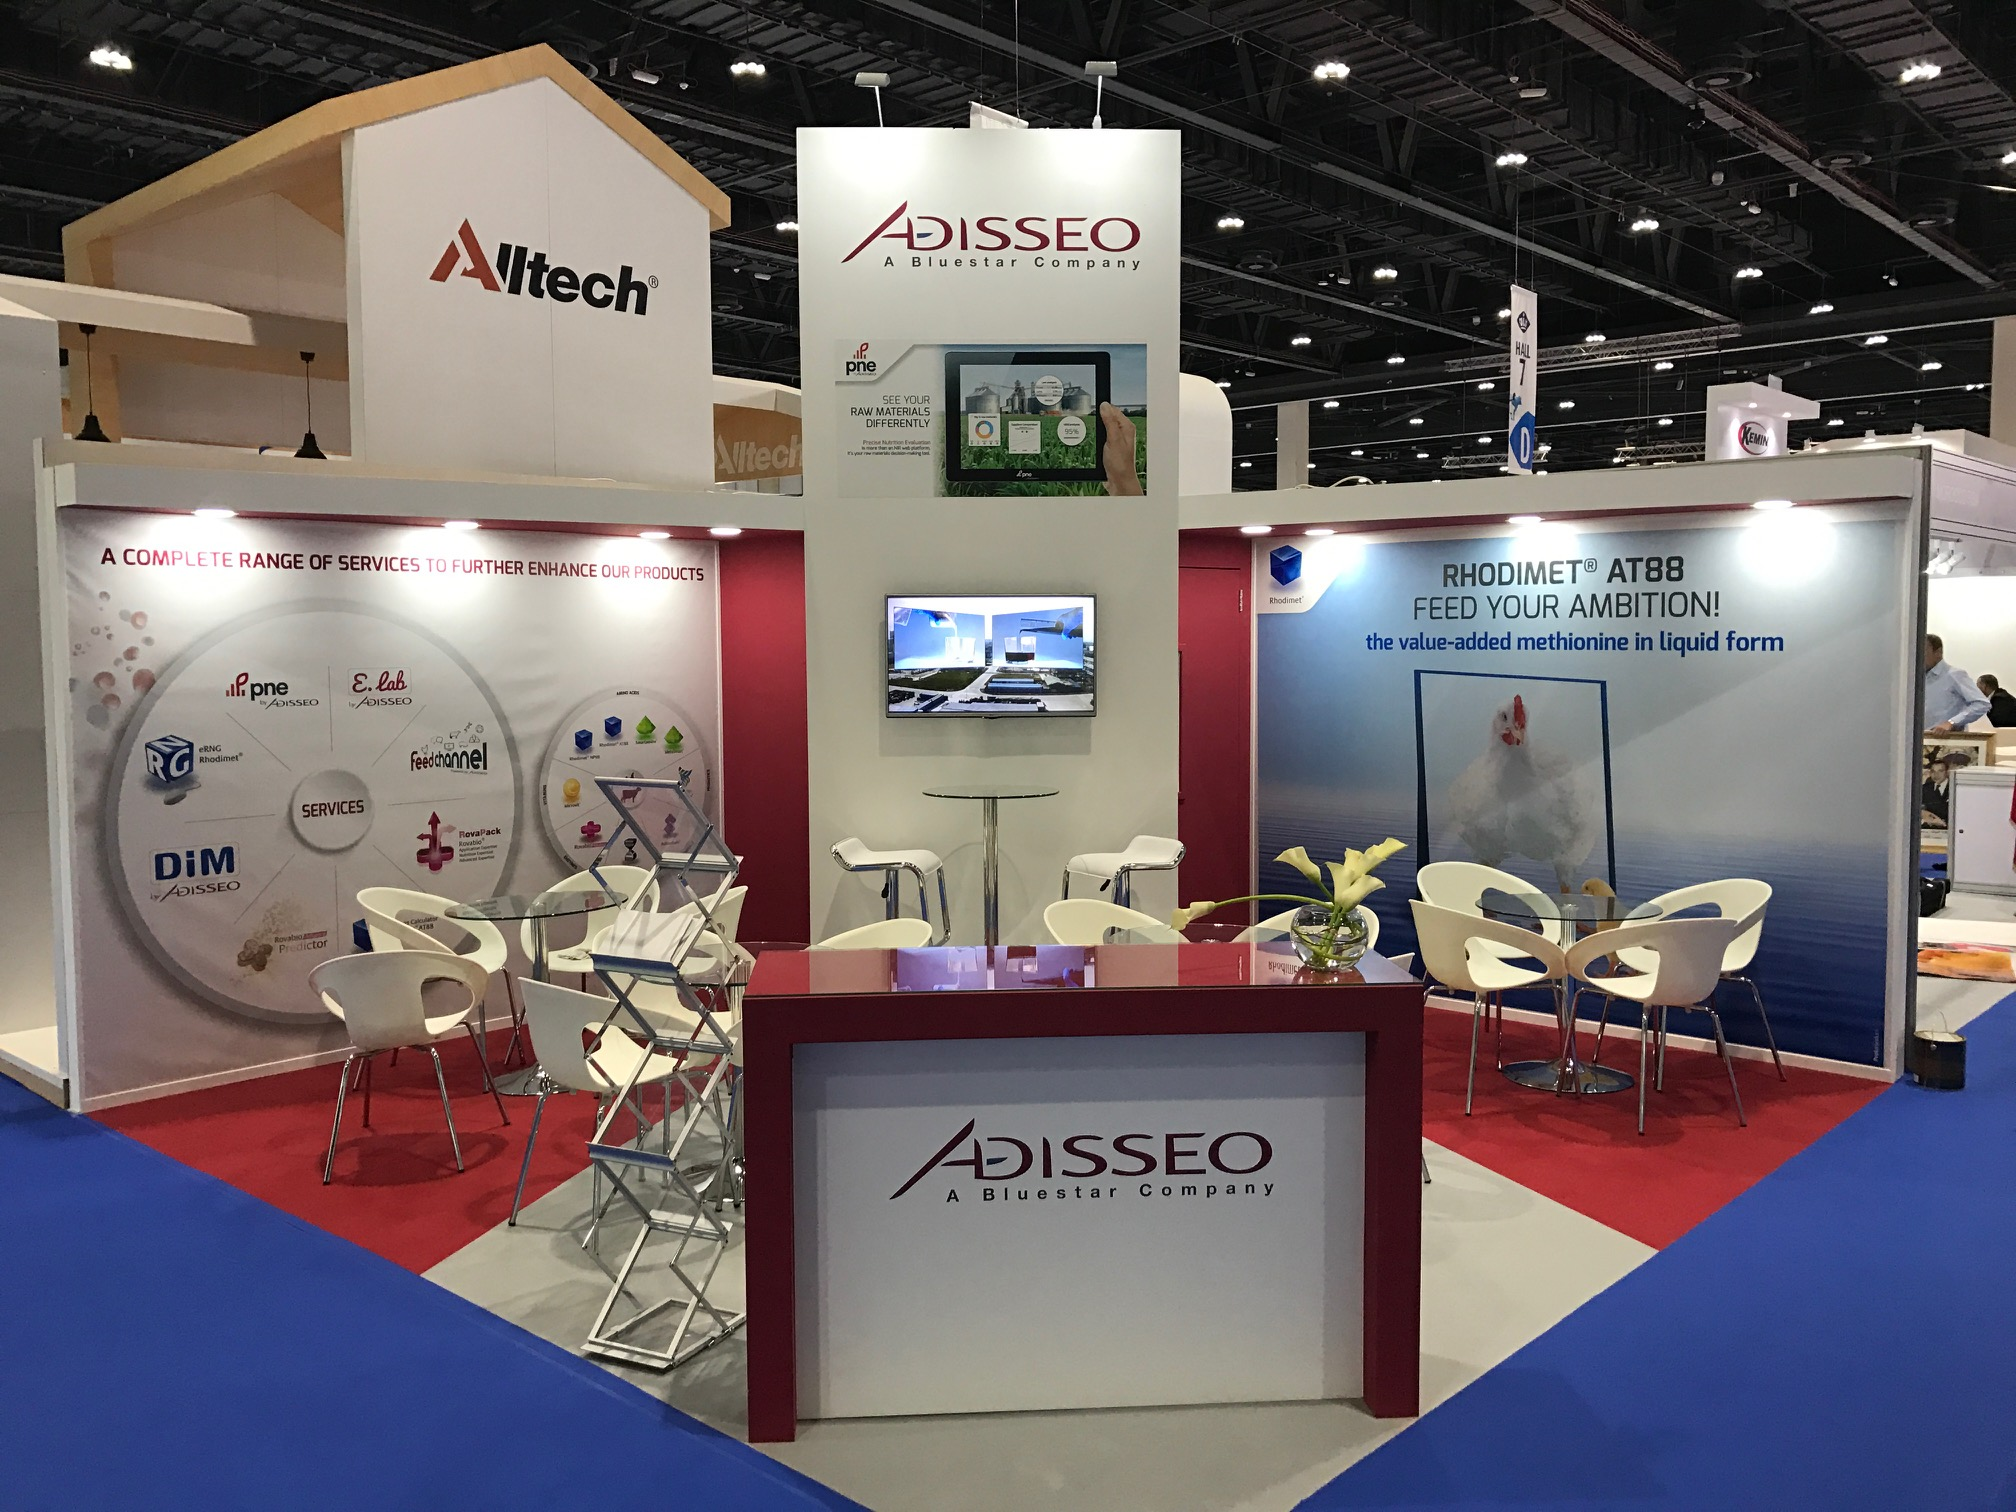 Bespoke stand design and build for Adisseo at VIV MEA 2018 ADNEC Abu Dhabi UAE